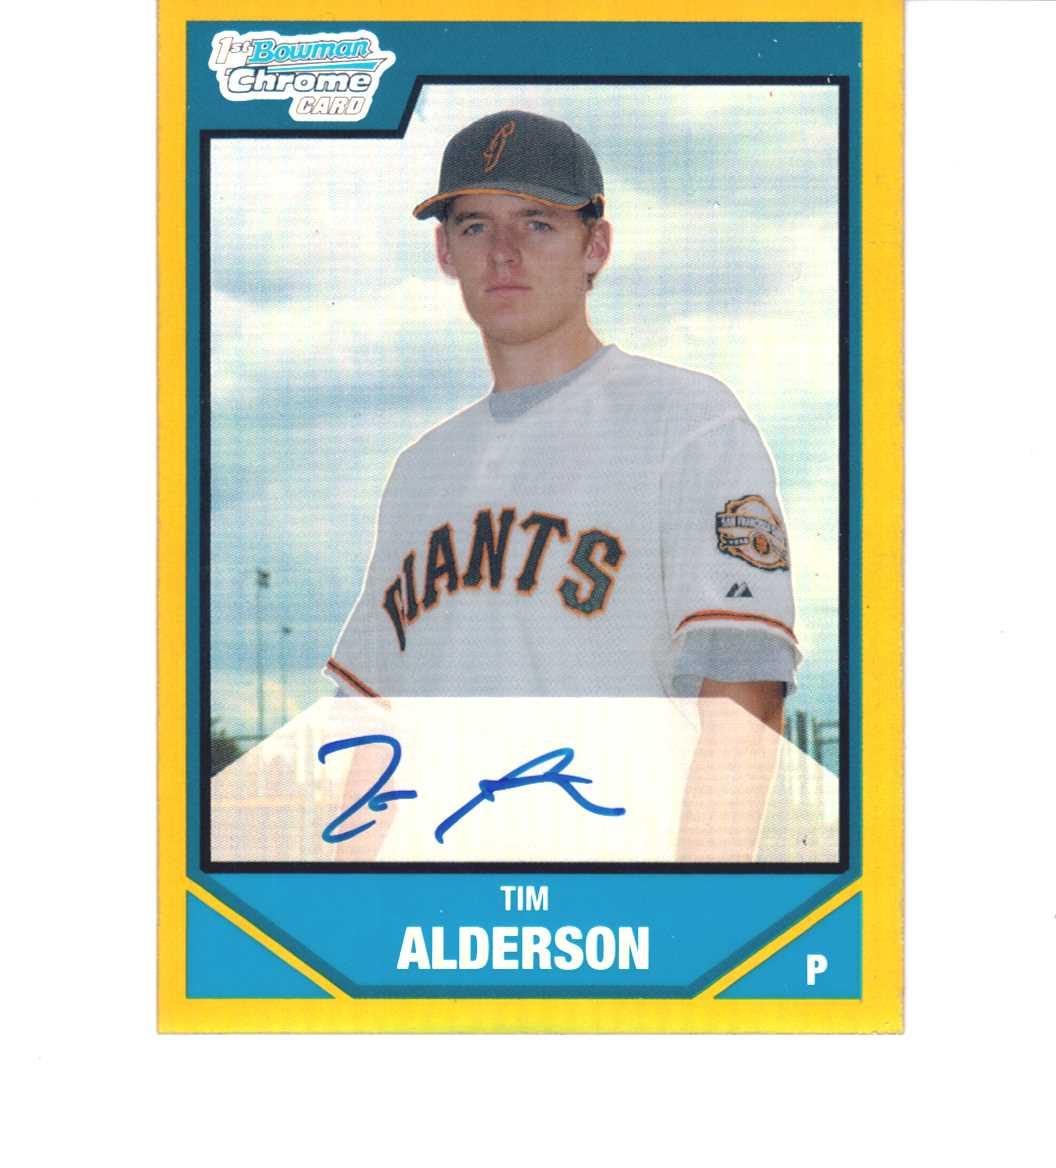 Tim Alderson 2007 Bowman Chrome Draft Picks Gold /50 Refractor Autograph BDPP113